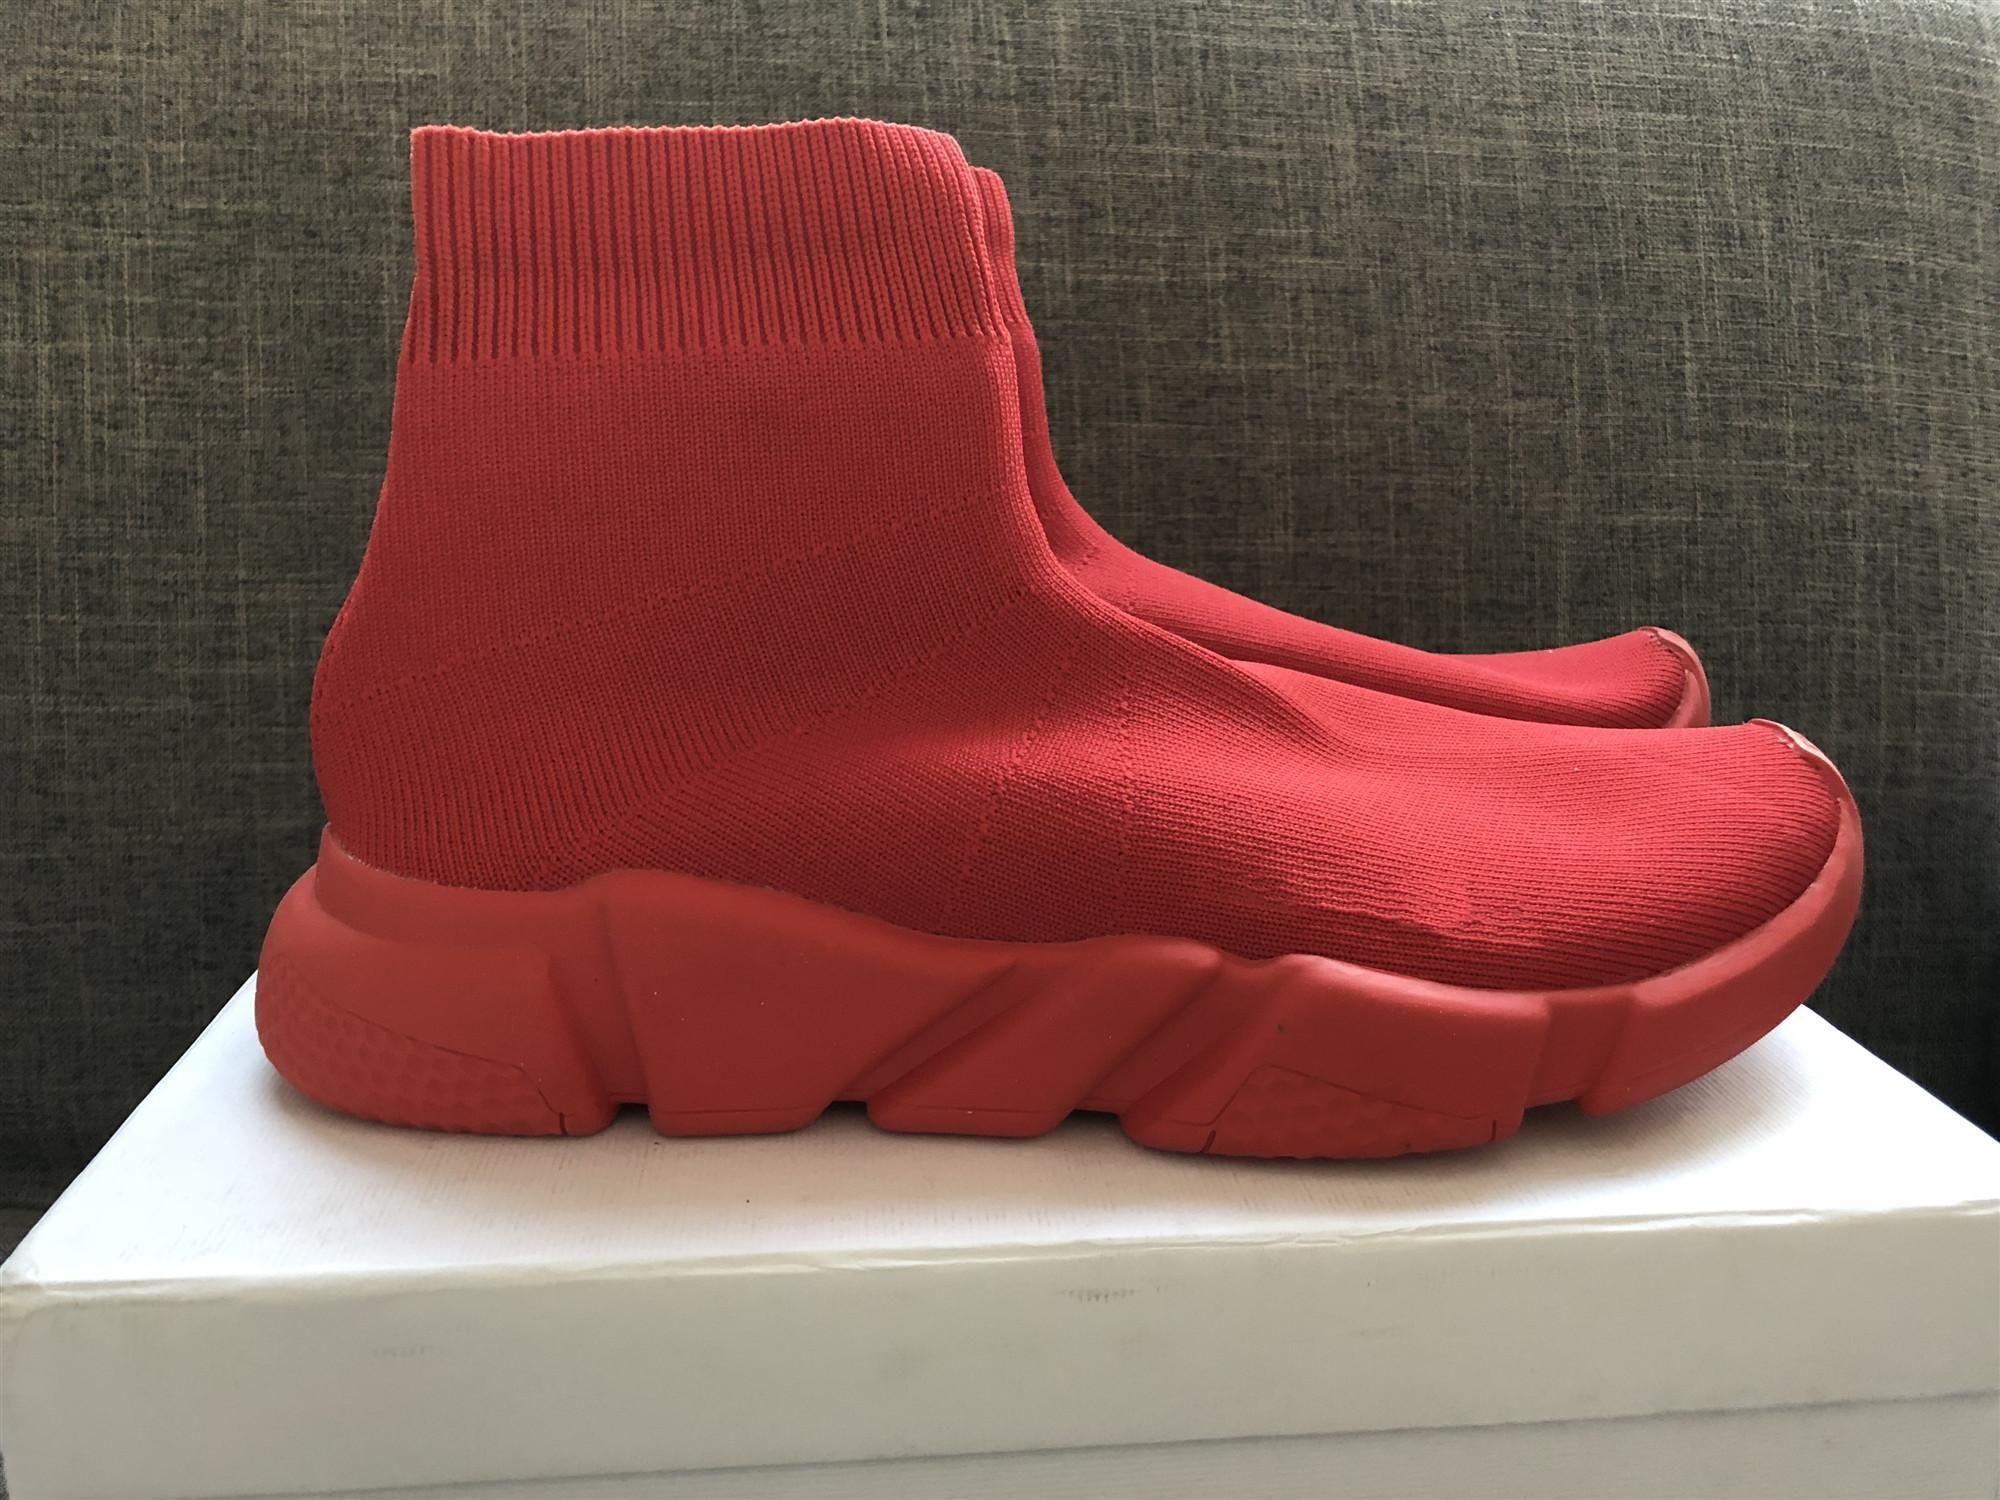 2020 Luxury Designer Sock Scarpe plate-forme Red bottomy costi-EFFS buoni uomini qualitective donna traspirante Calzino Race nero Scarpe C04